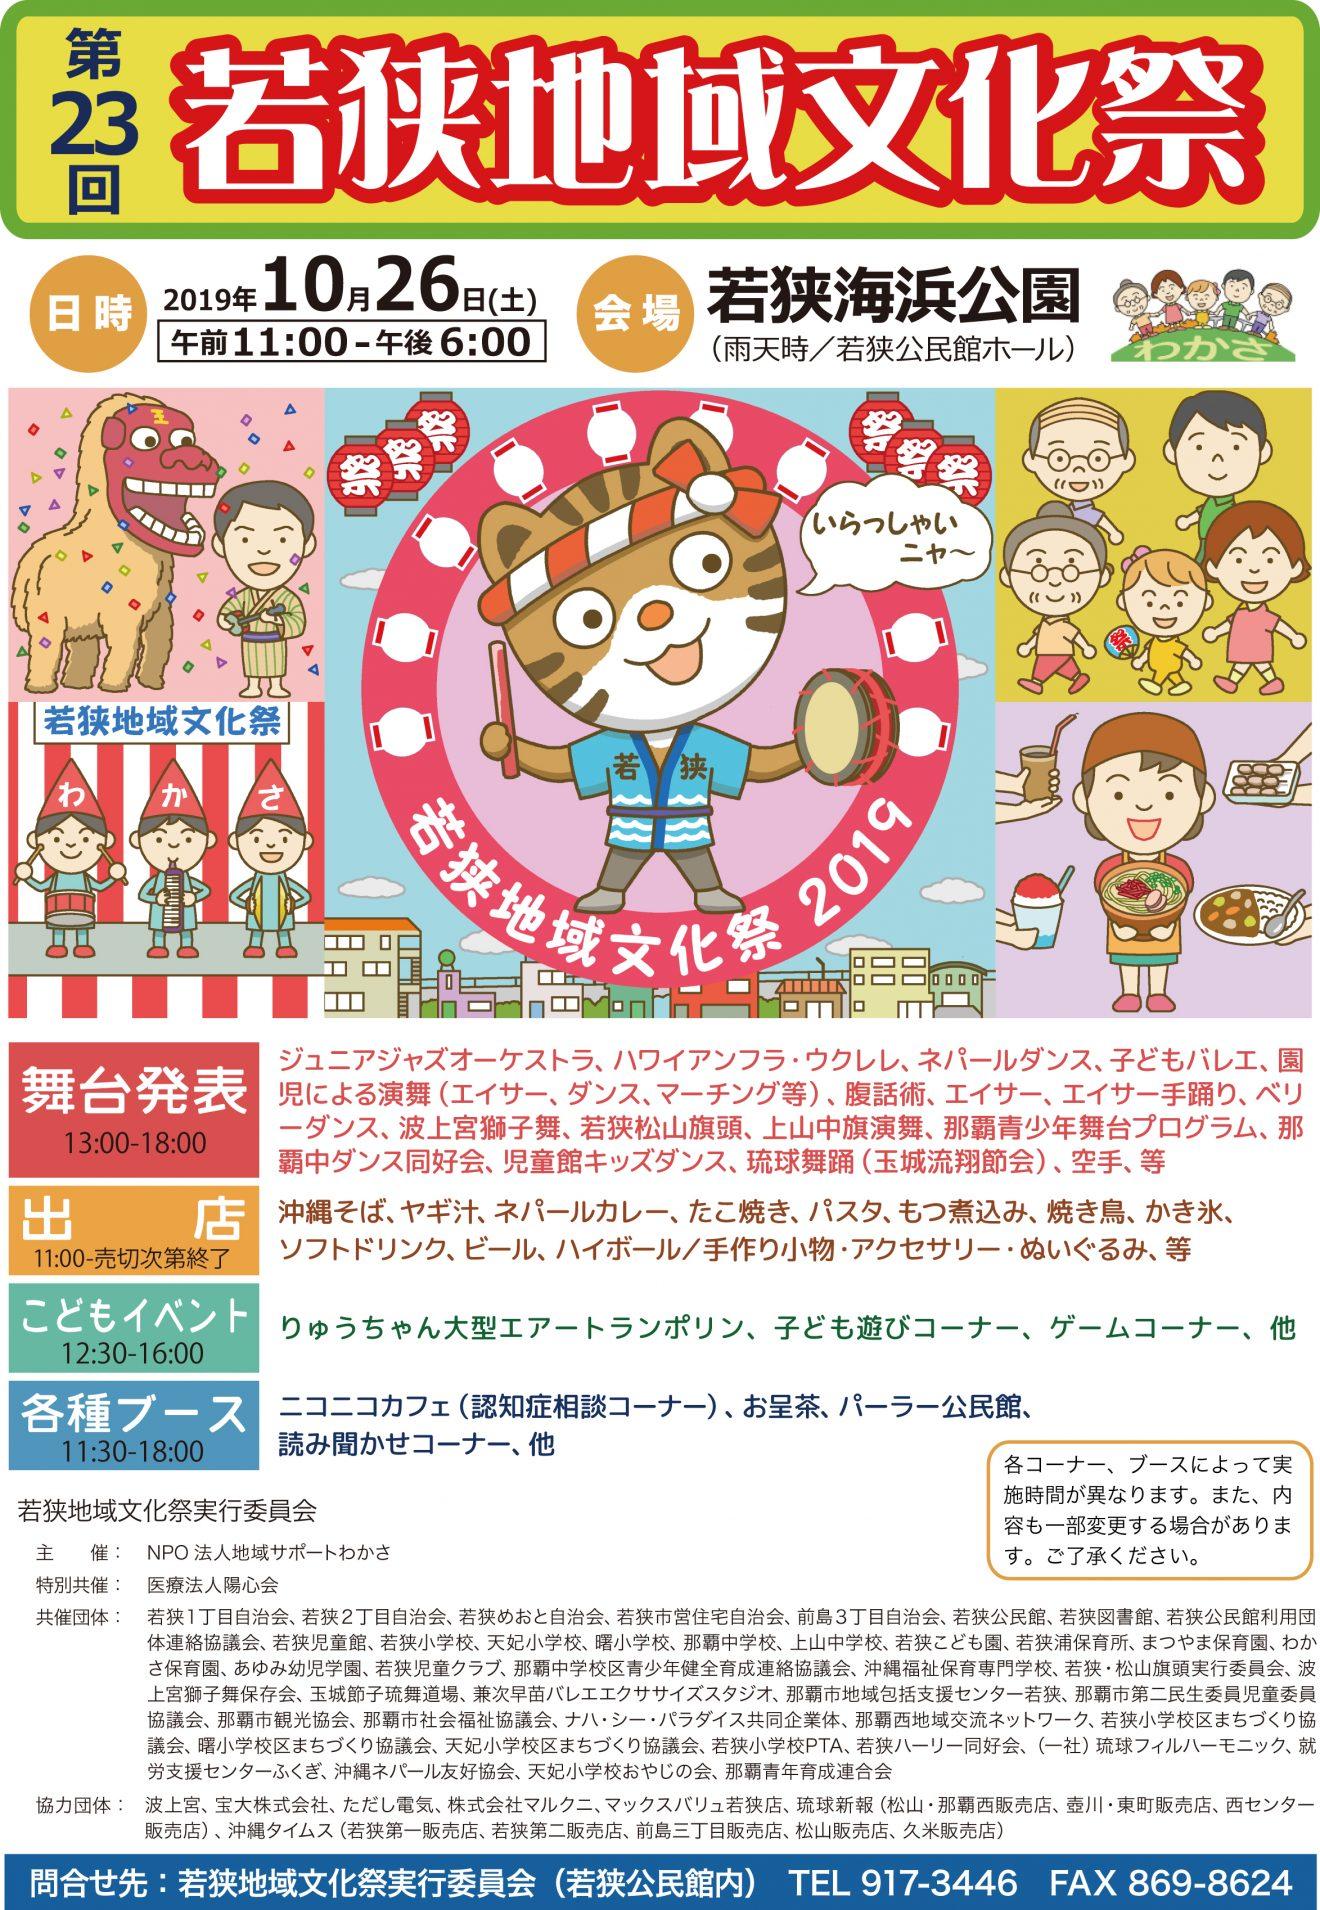 第23回若狭地域文化祭ポスター